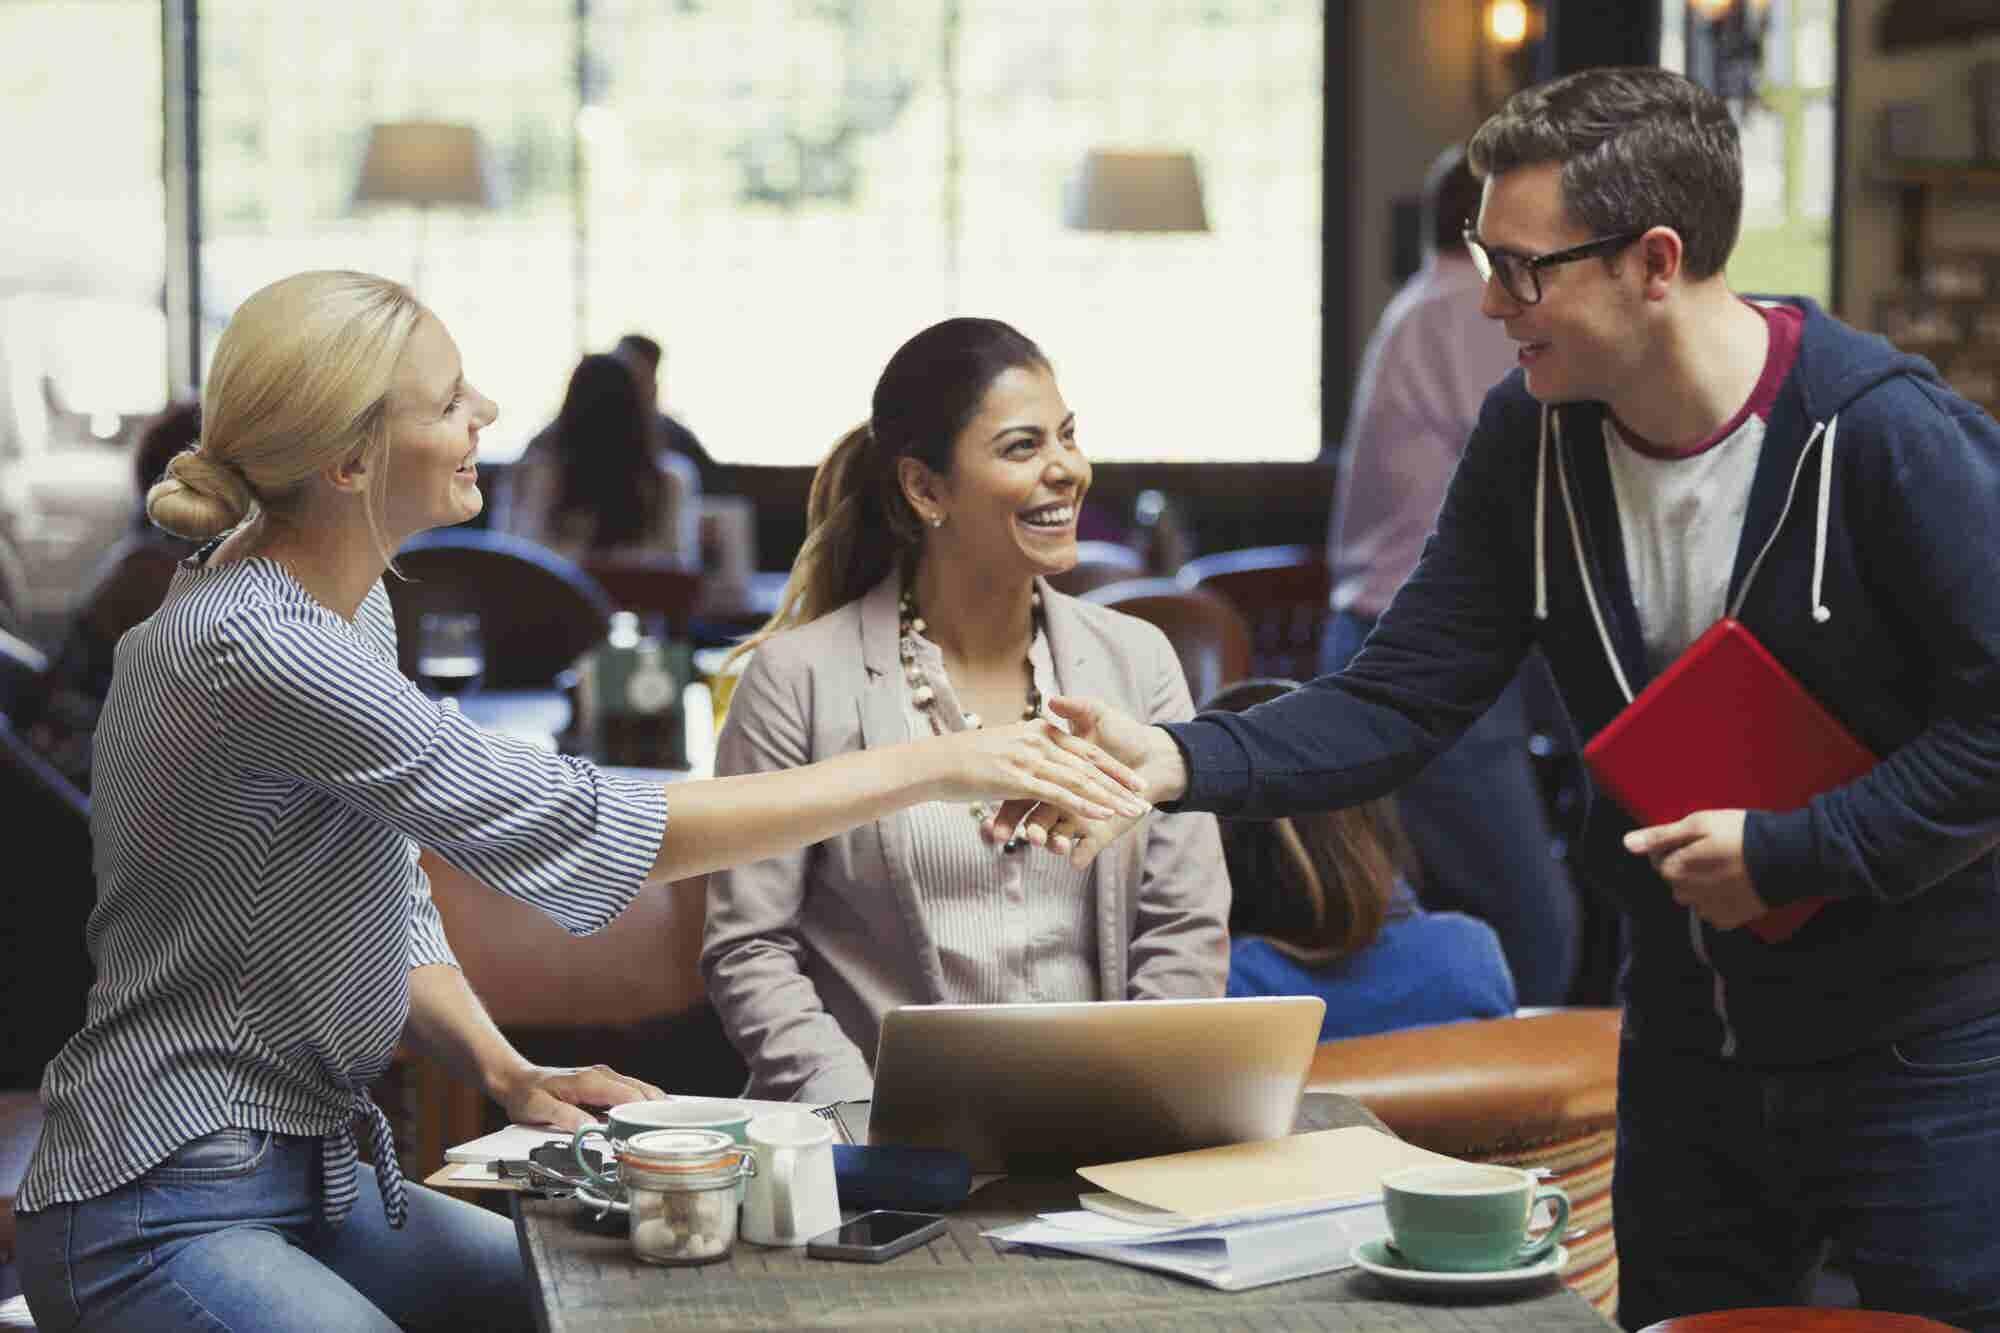 No Time for Marketing? Hire a Freelancer.